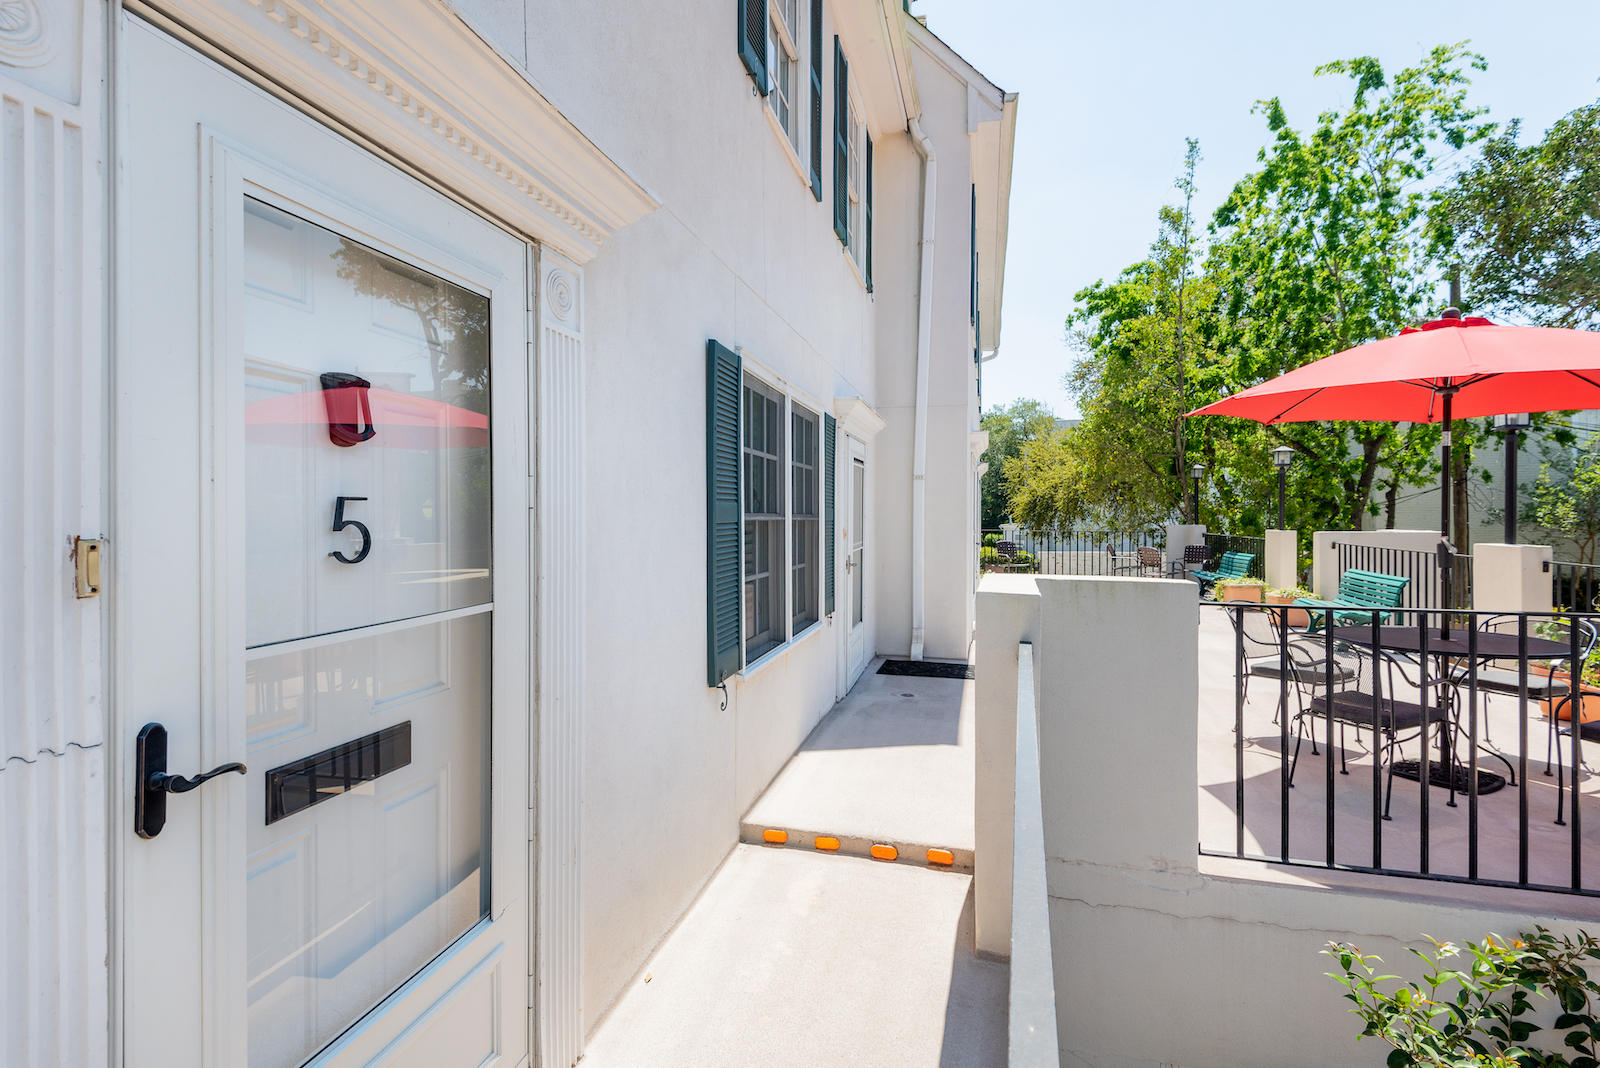 Harleston Village Homes For Sale - 15 Horlbeck, Charleston, SC - 6